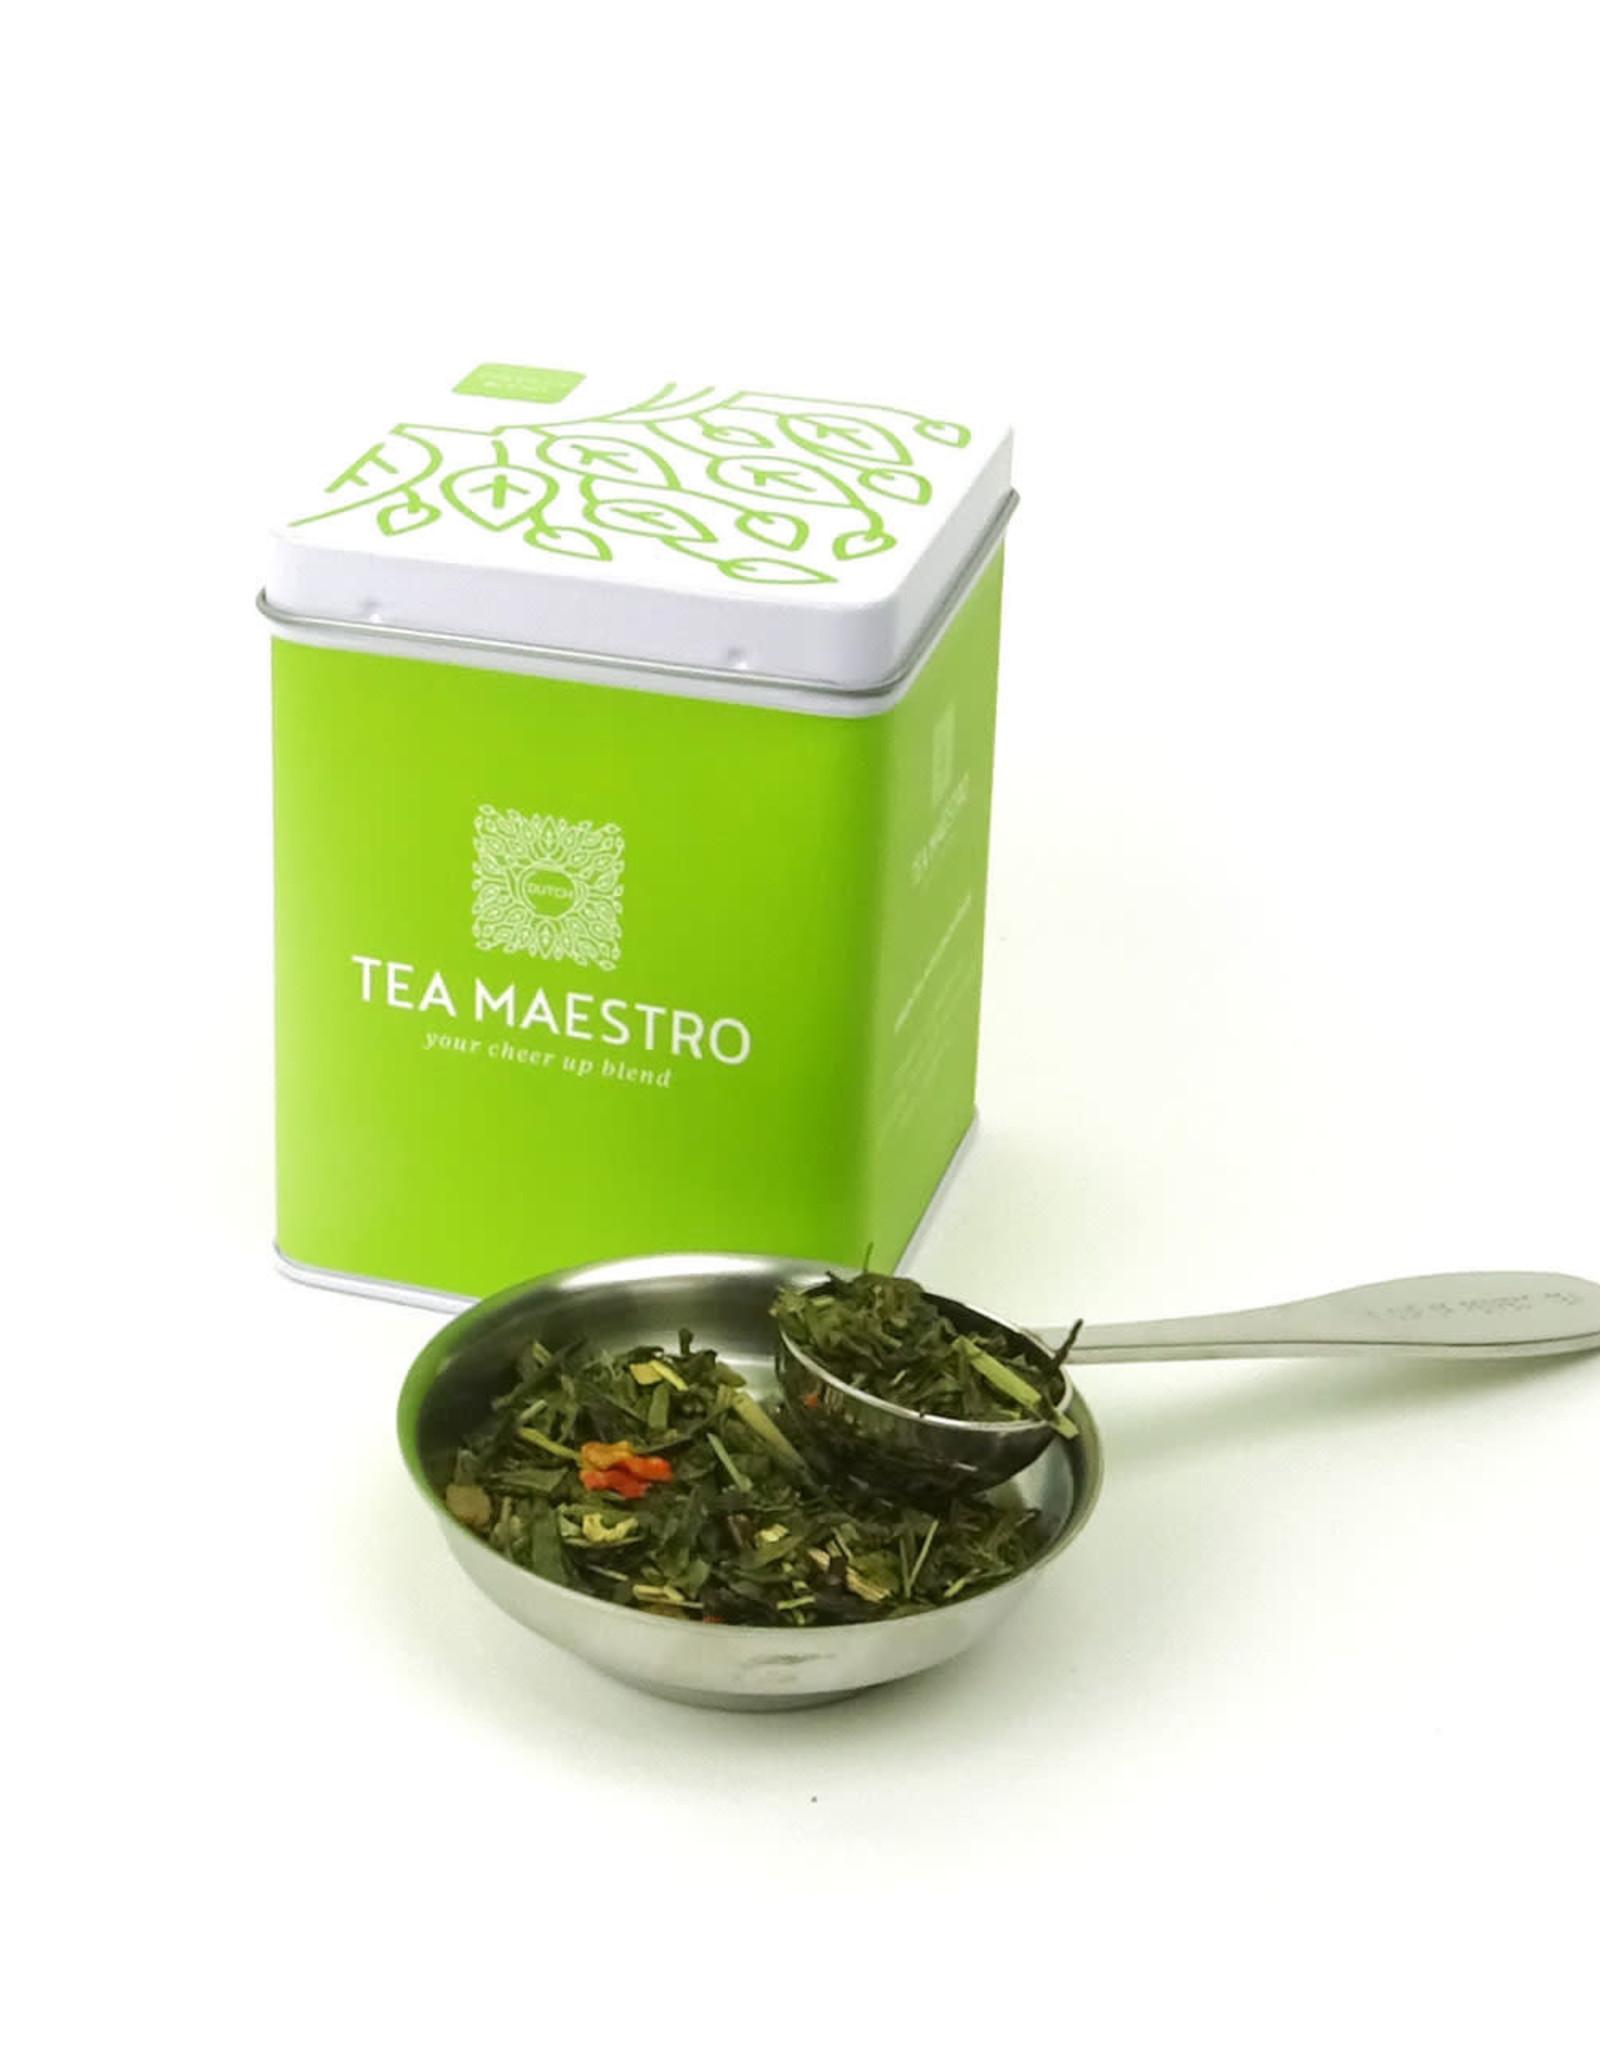 Dutch Tea Maestro Tea CHEER UP - Blend in Blik 80 gr